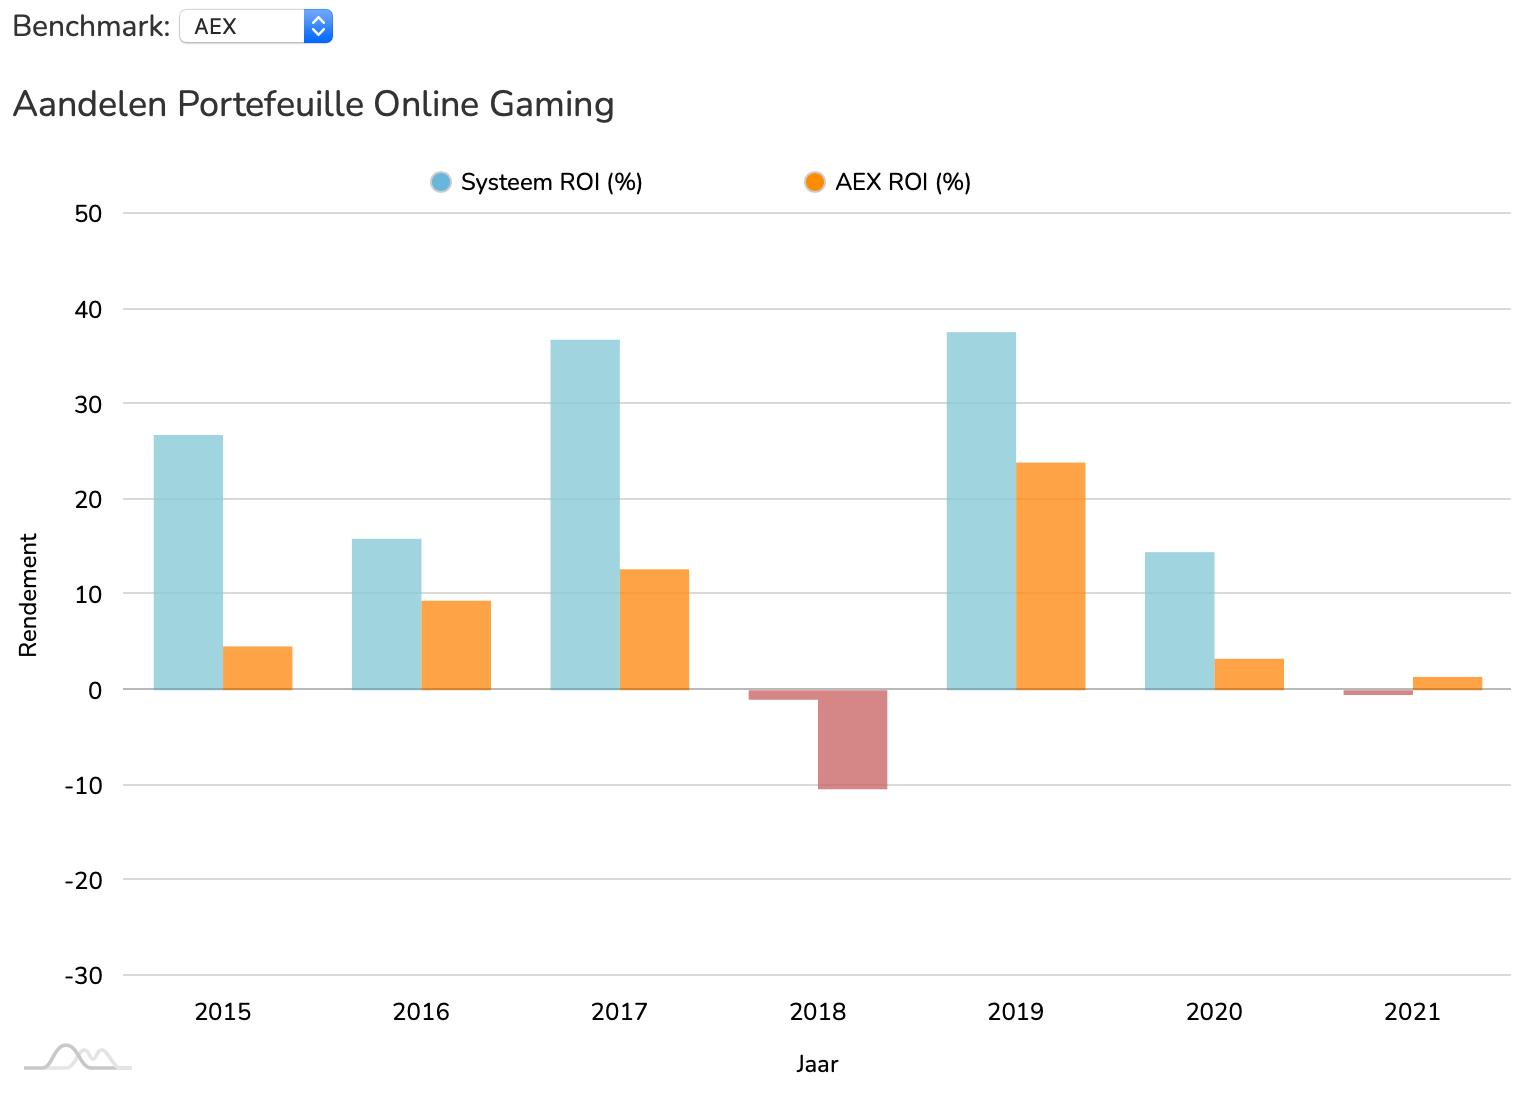 Aandelen Online Gaming ROI vs AEX